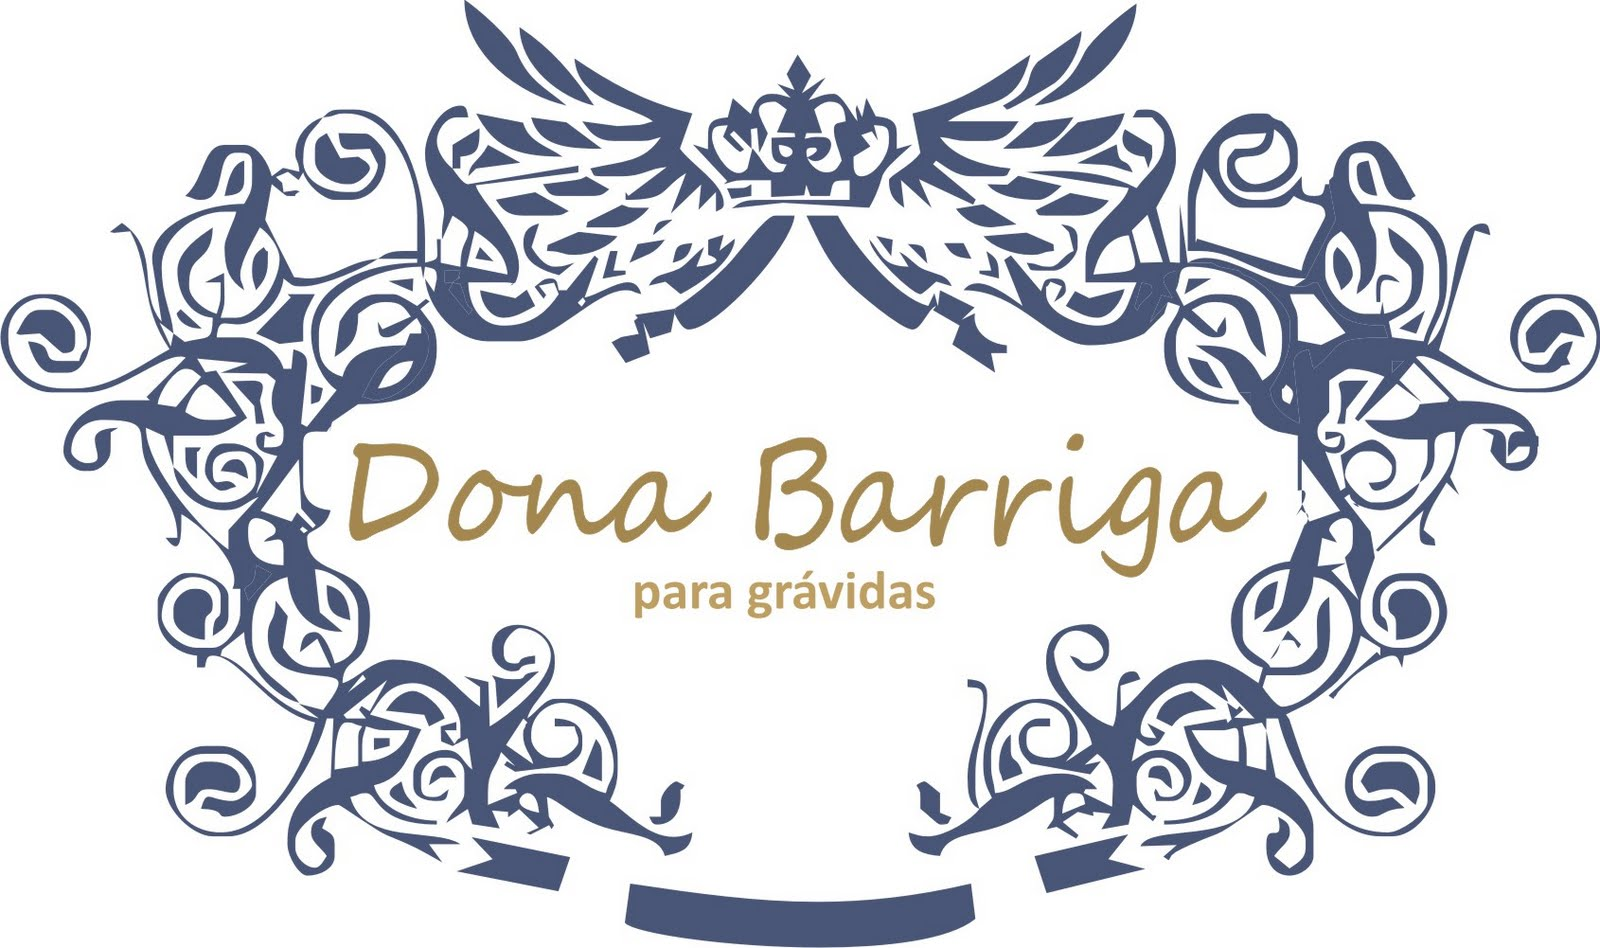 DONA BARRIGA - Foz do Iguaçu